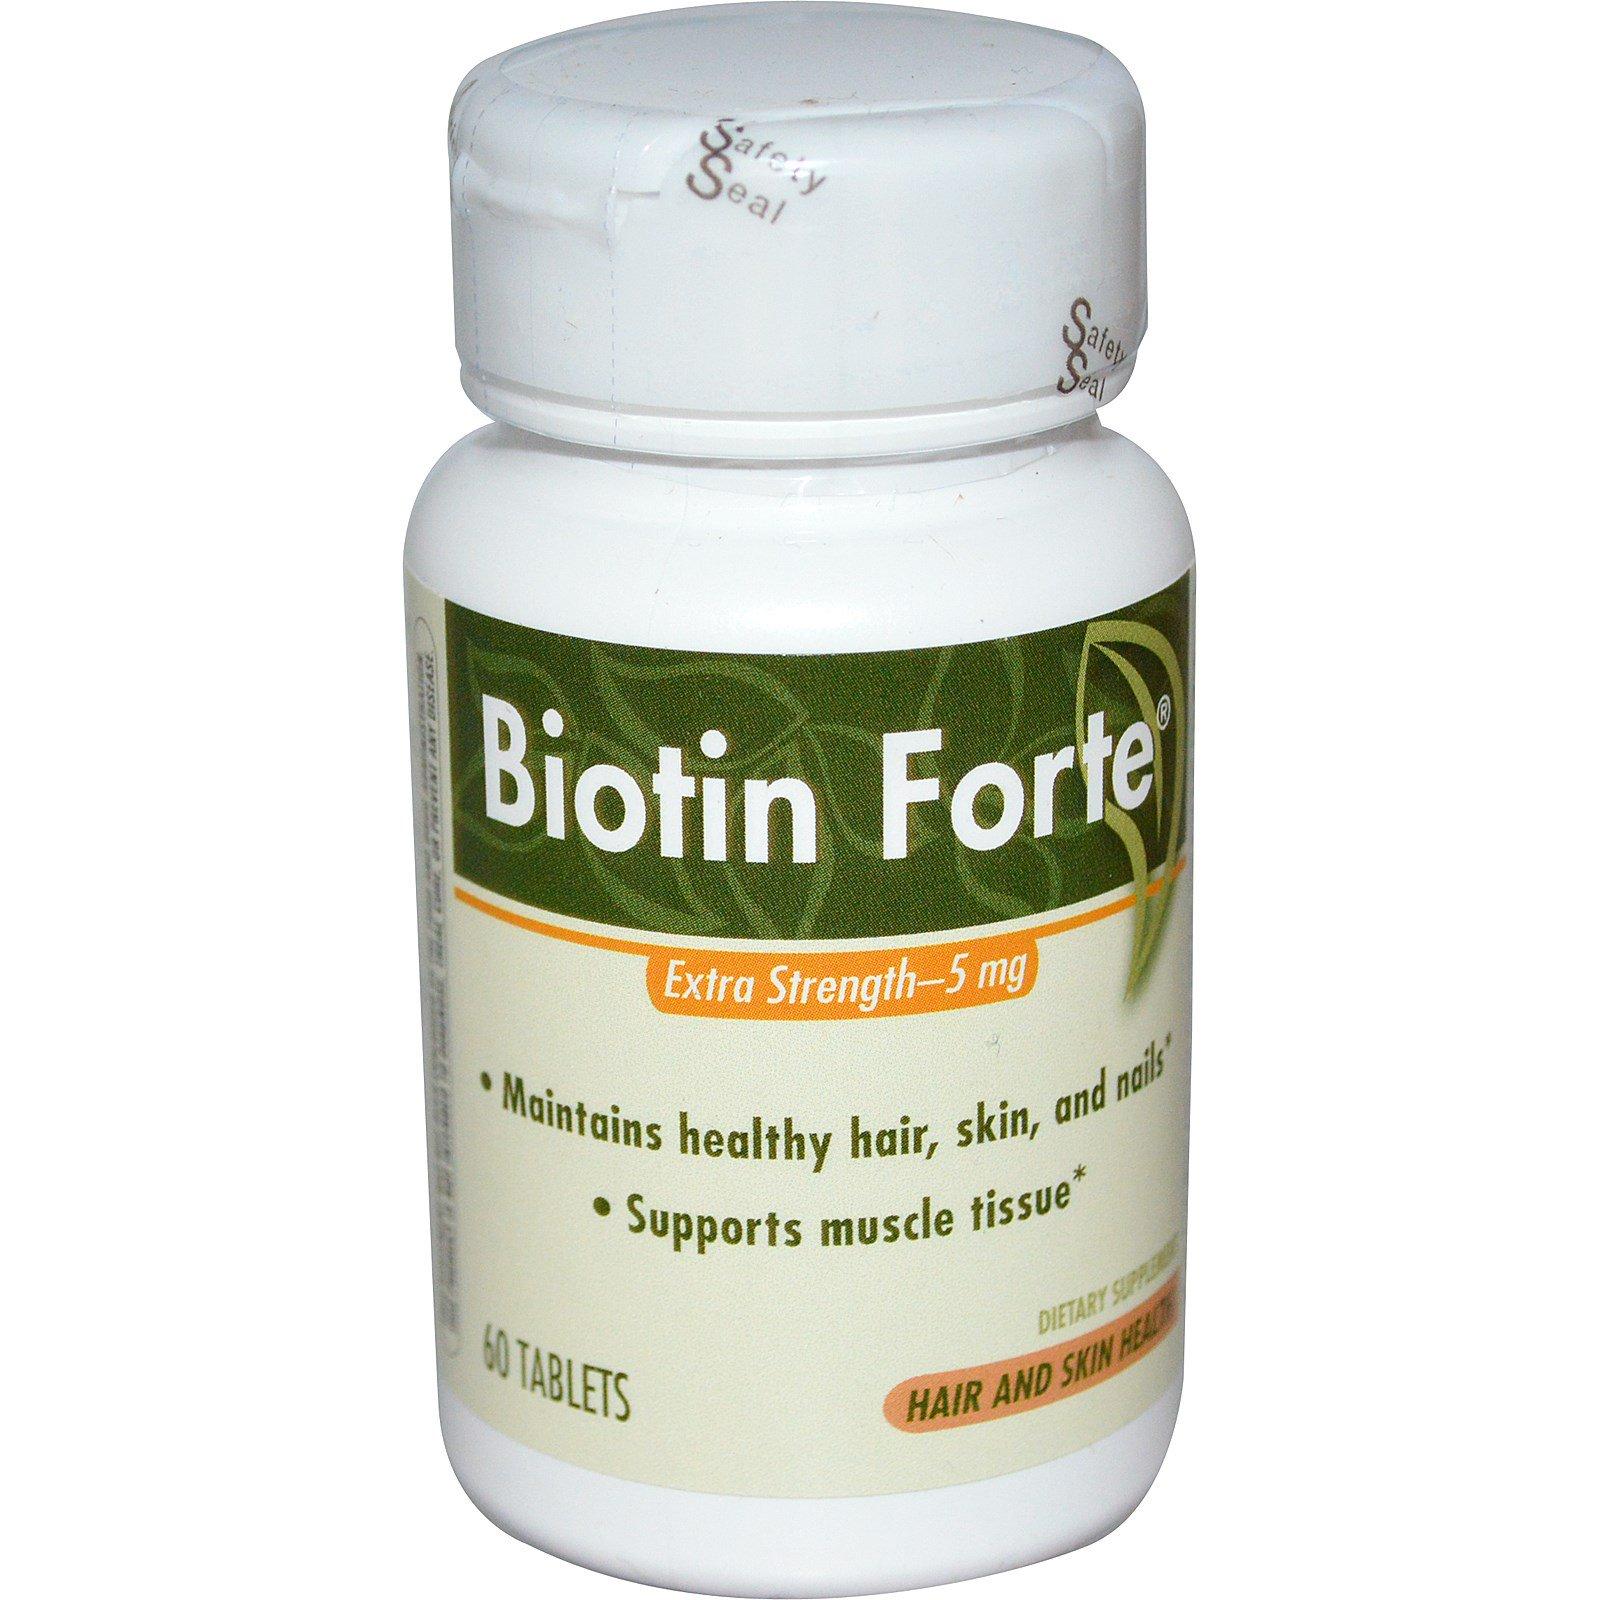 Enzymatic Therapy, Биотин Форте, Повышенная сила действия, 5 мг, 60 таблеток